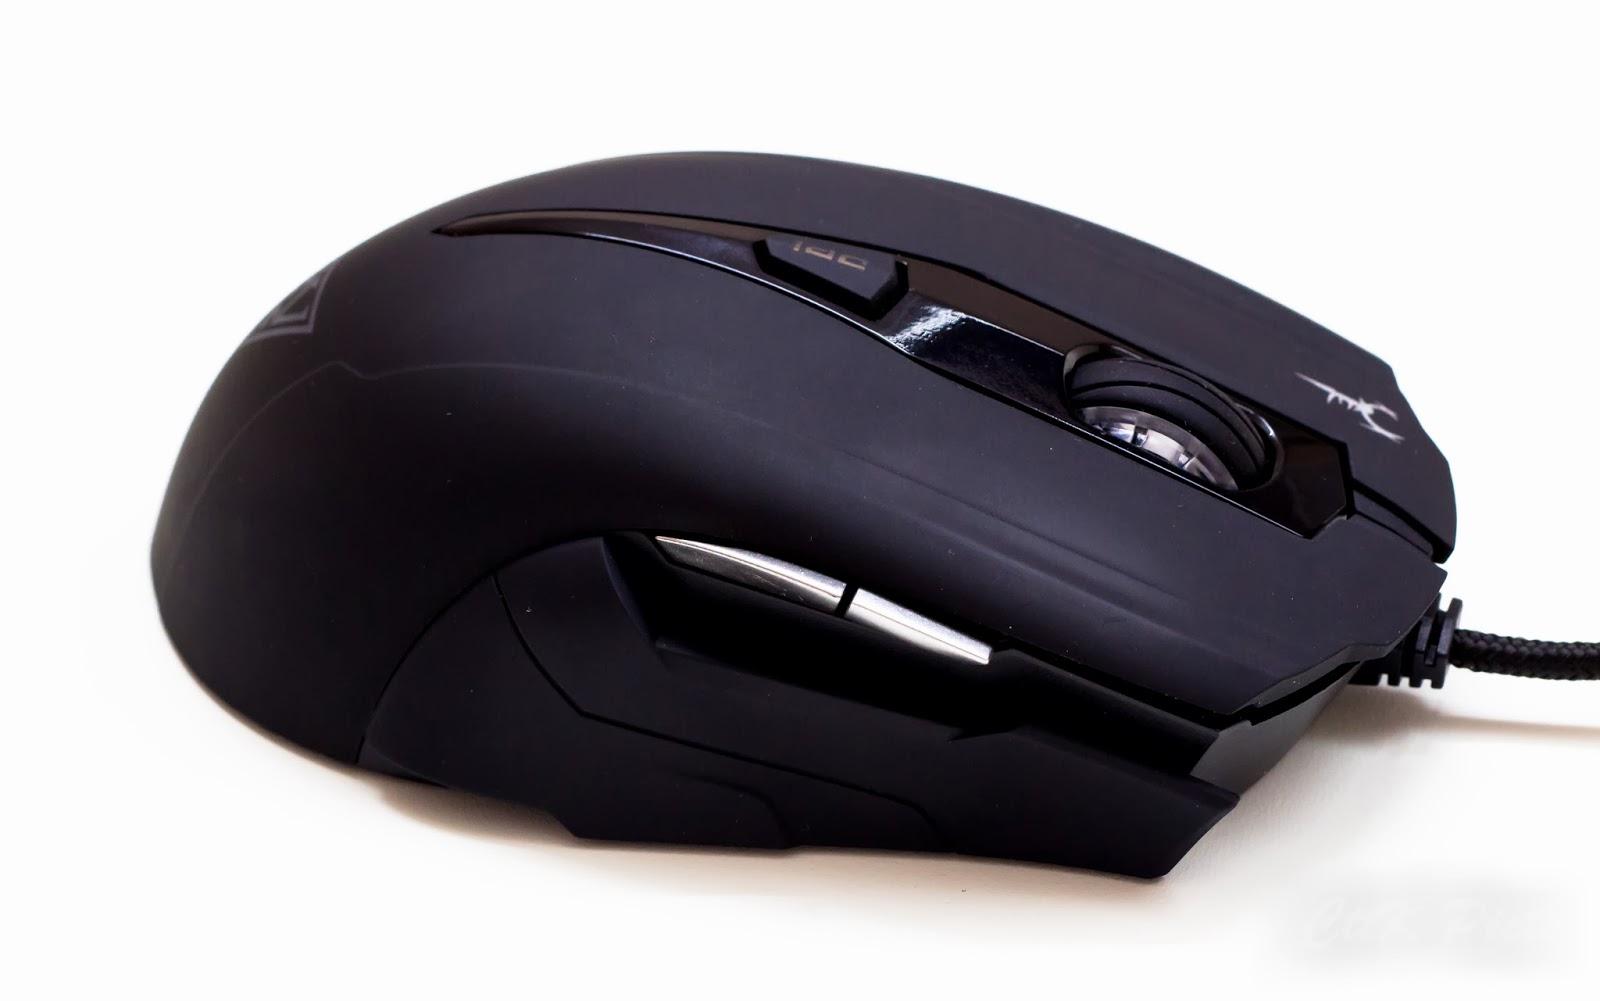 Gamdias Hades Extension Optical Gaming Mouse 58